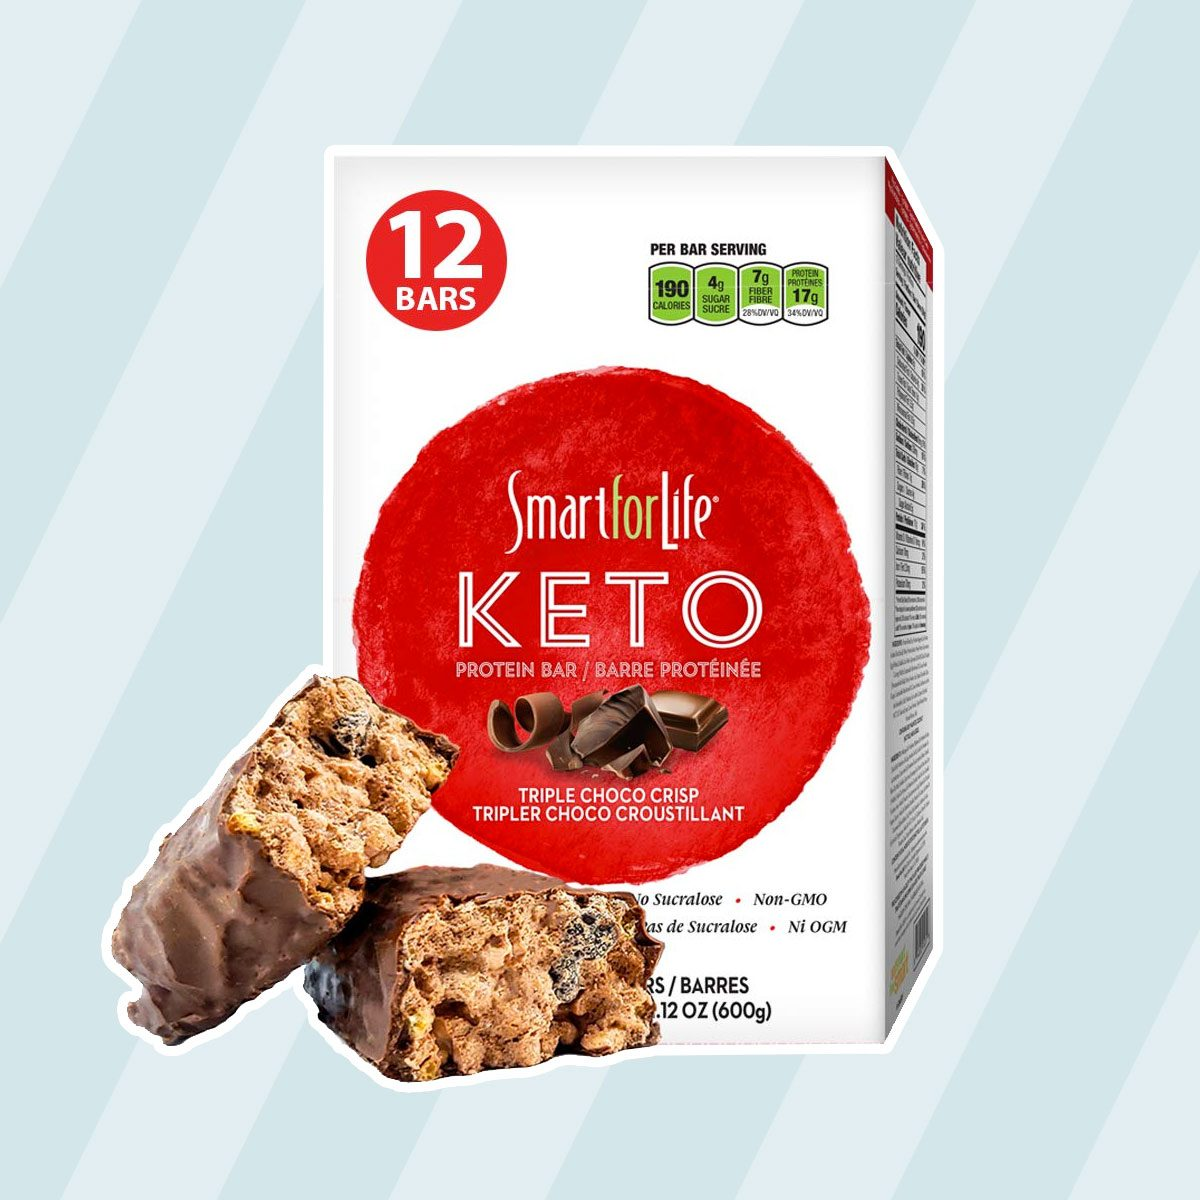 Smart for Life Keto Bars keto snack bars